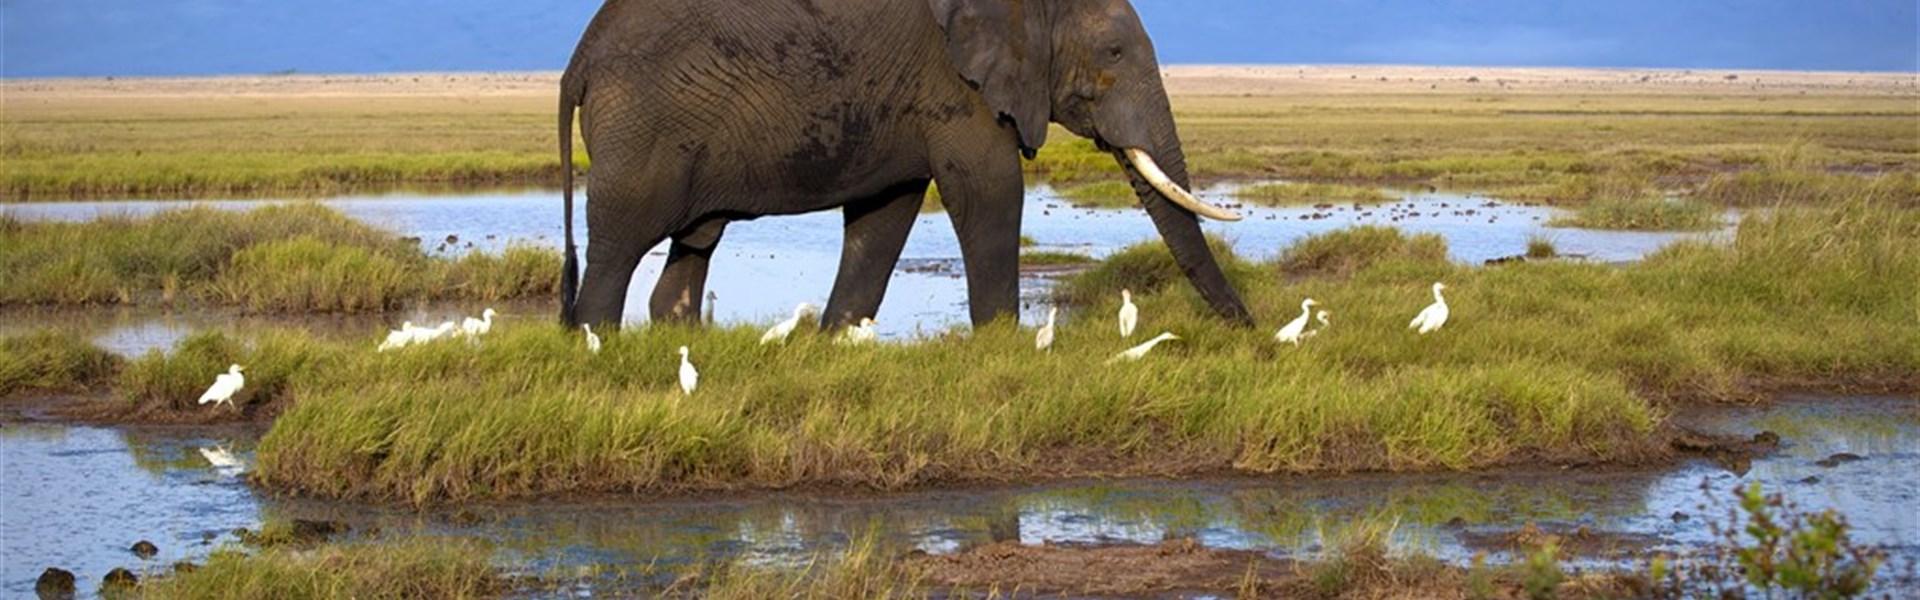 Marco Polo - Safari v Keni - Amboseli, Tsavo - Safari v Keni s Marco Polo_Amboseli